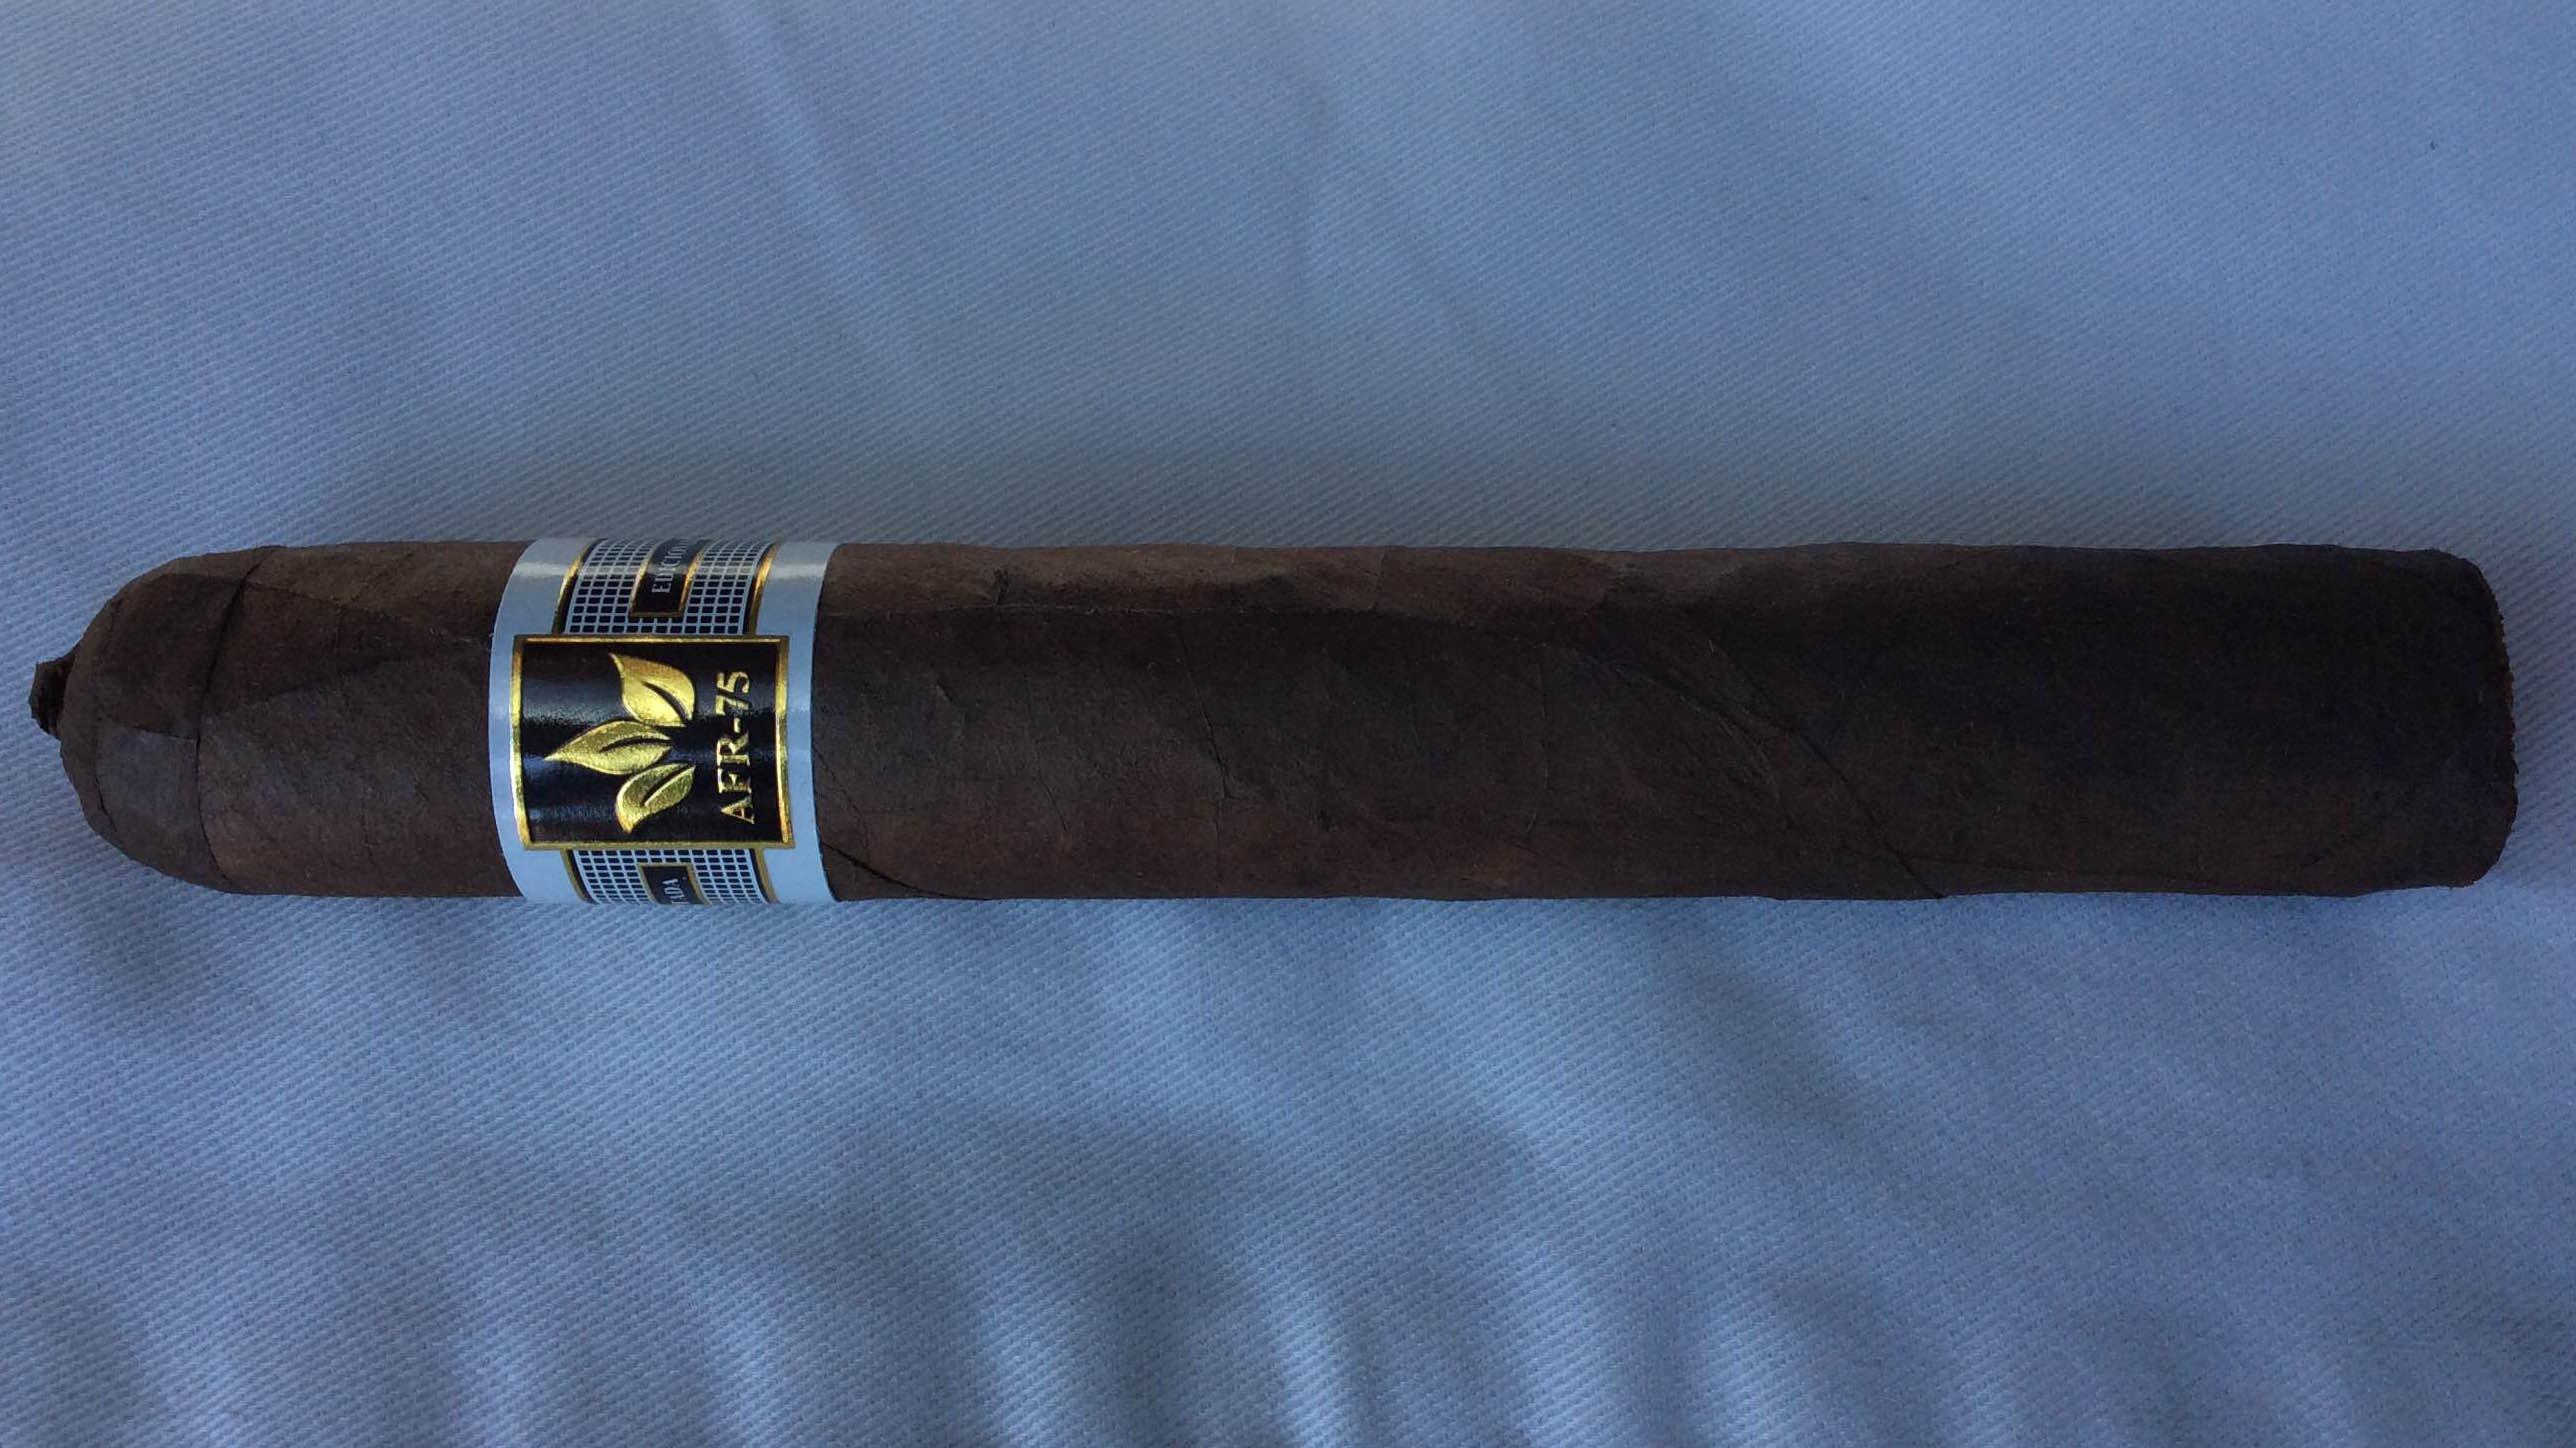 AFR-75_Edmundo_by_PDR_Cigars